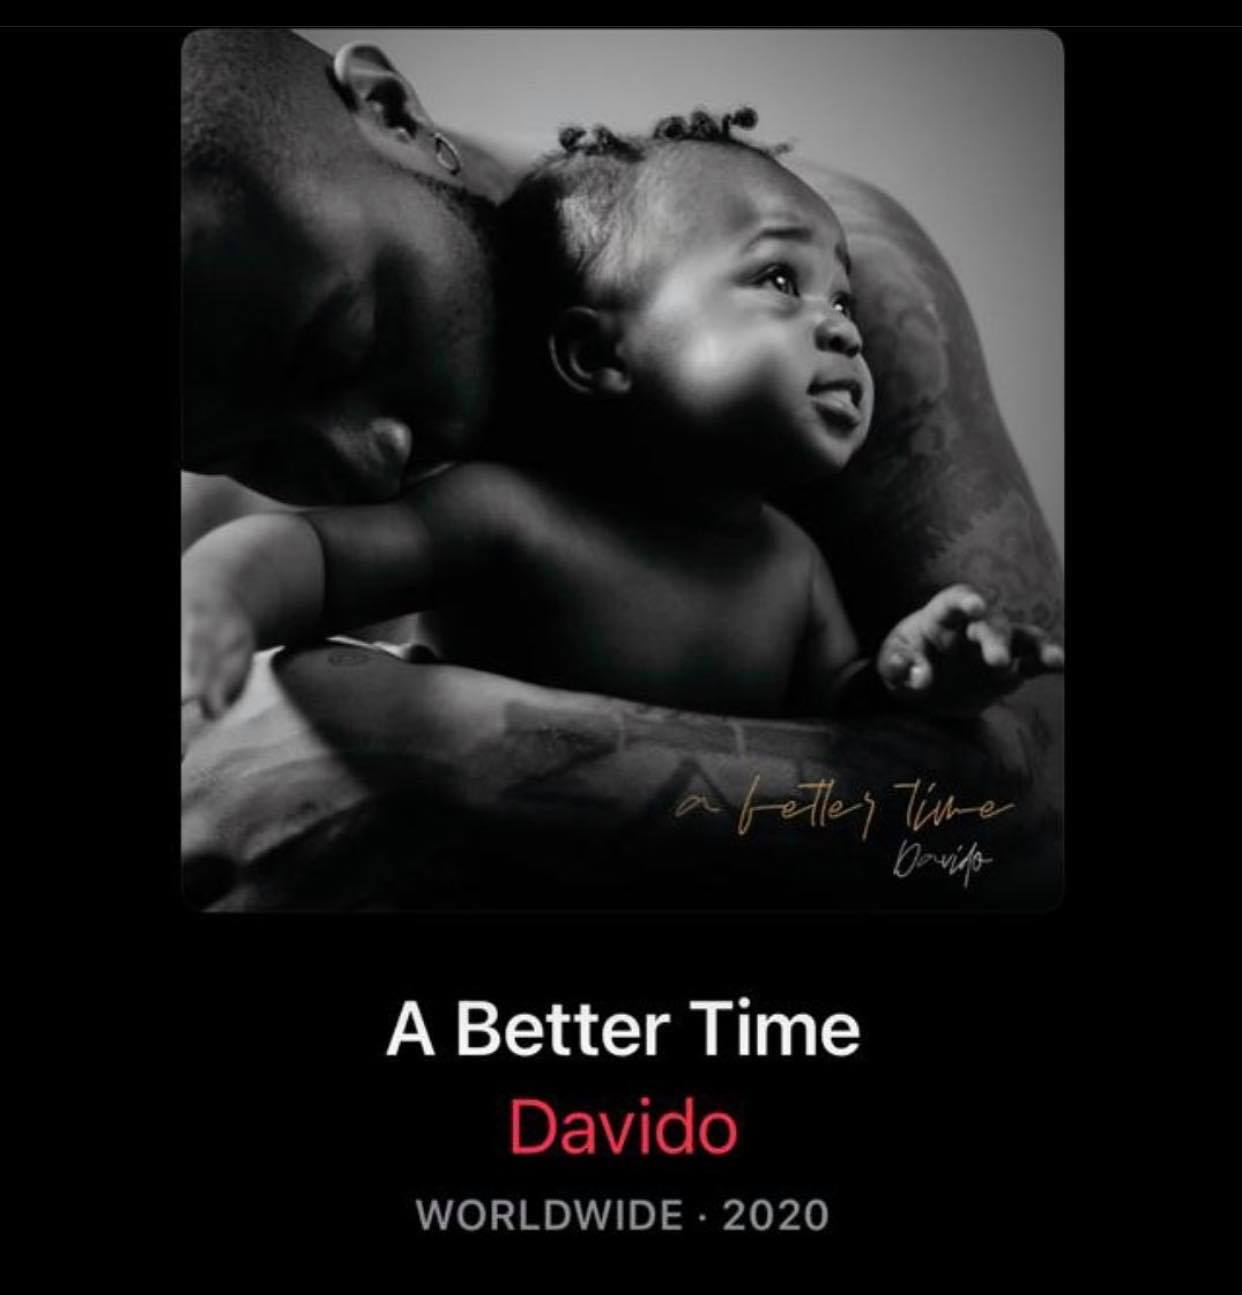 Davido – Shopping Spree Instrumental ft. Chris Brown x Young Thug (Reprod. By Pizole Beats)